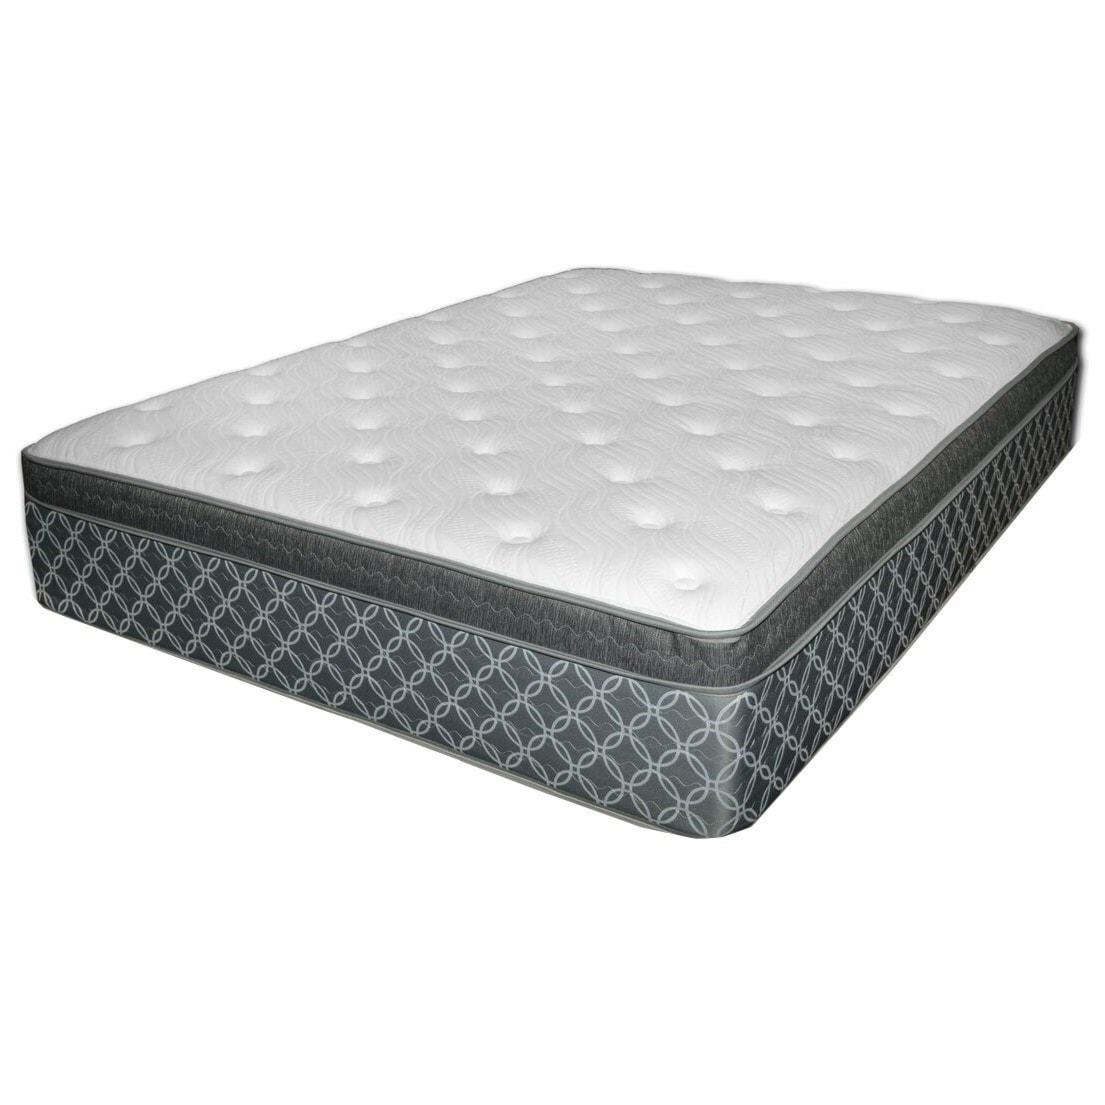 king pillow top mattress. Somerset Pillow Top King Plush Mattress By Spring Air